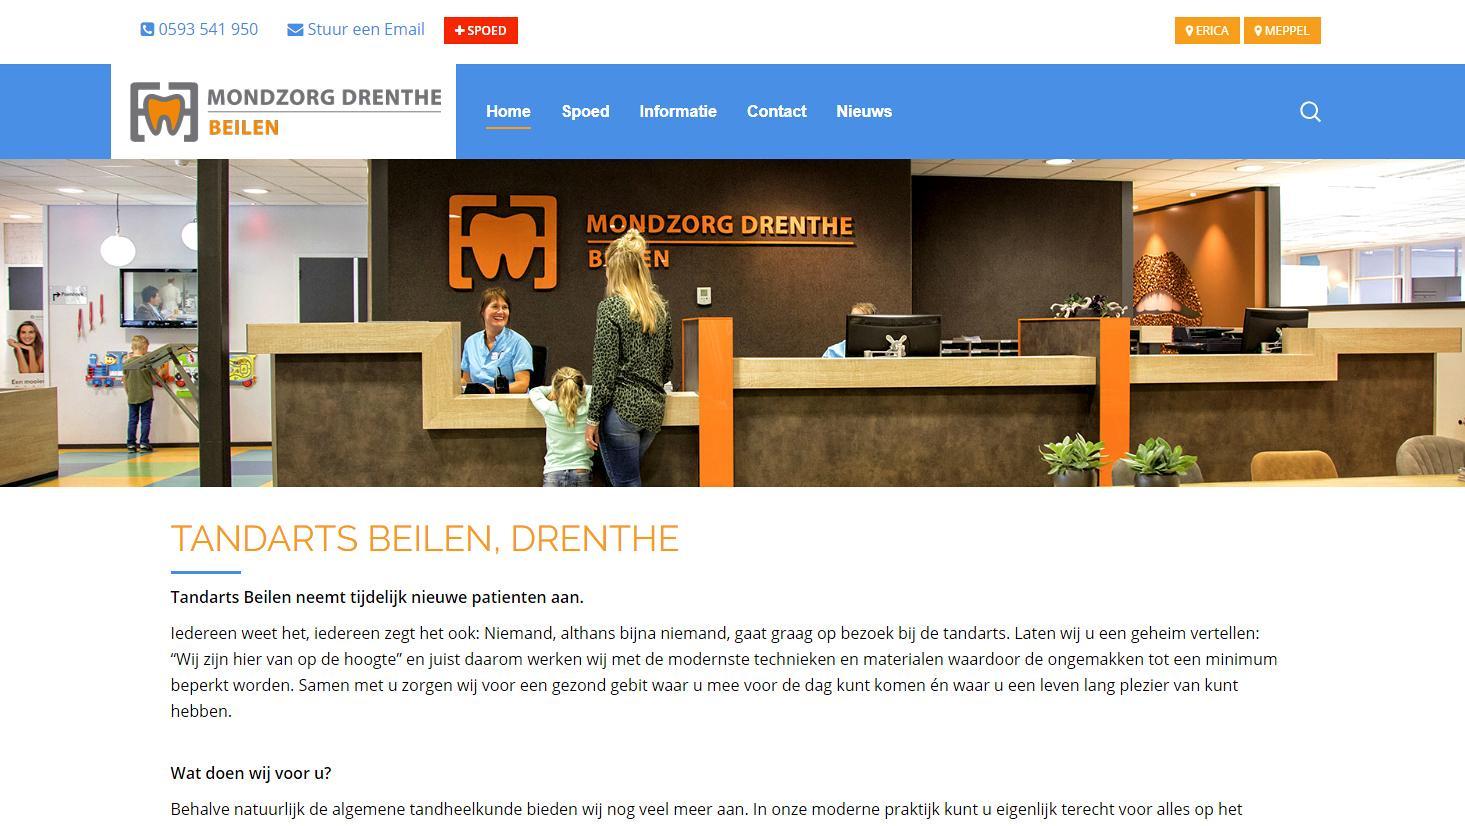 Mondzorg Drenthe